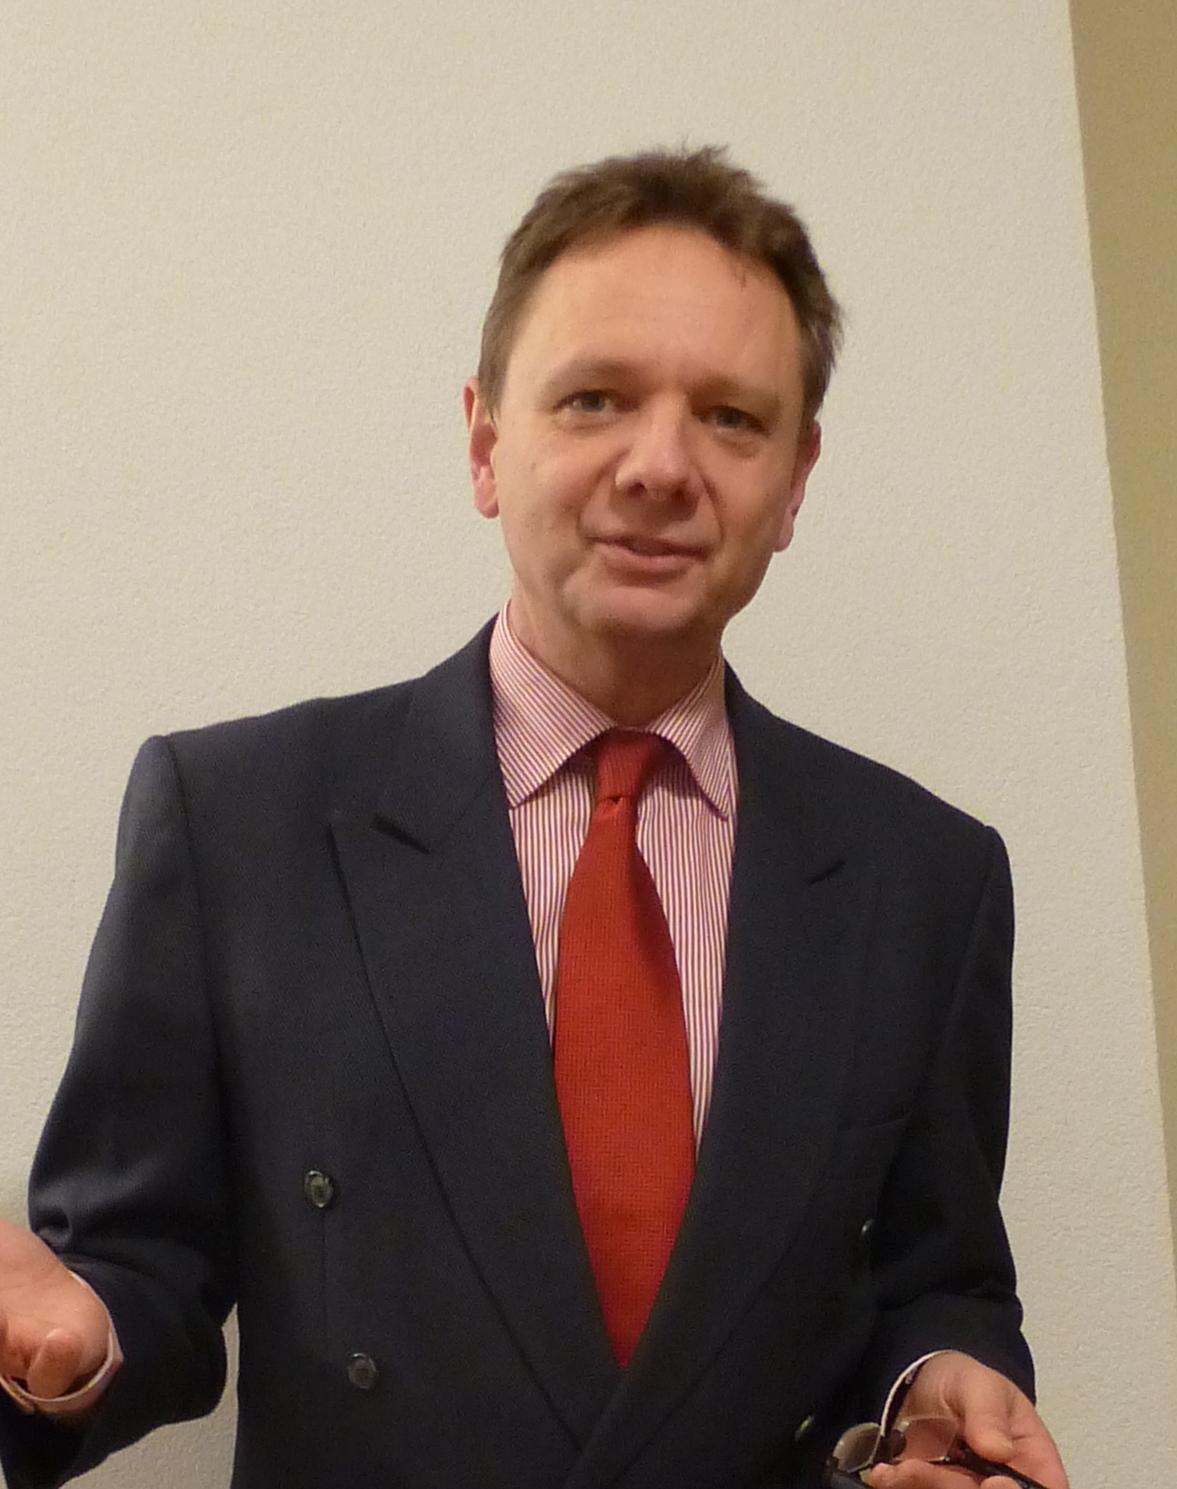 Roland Notermans